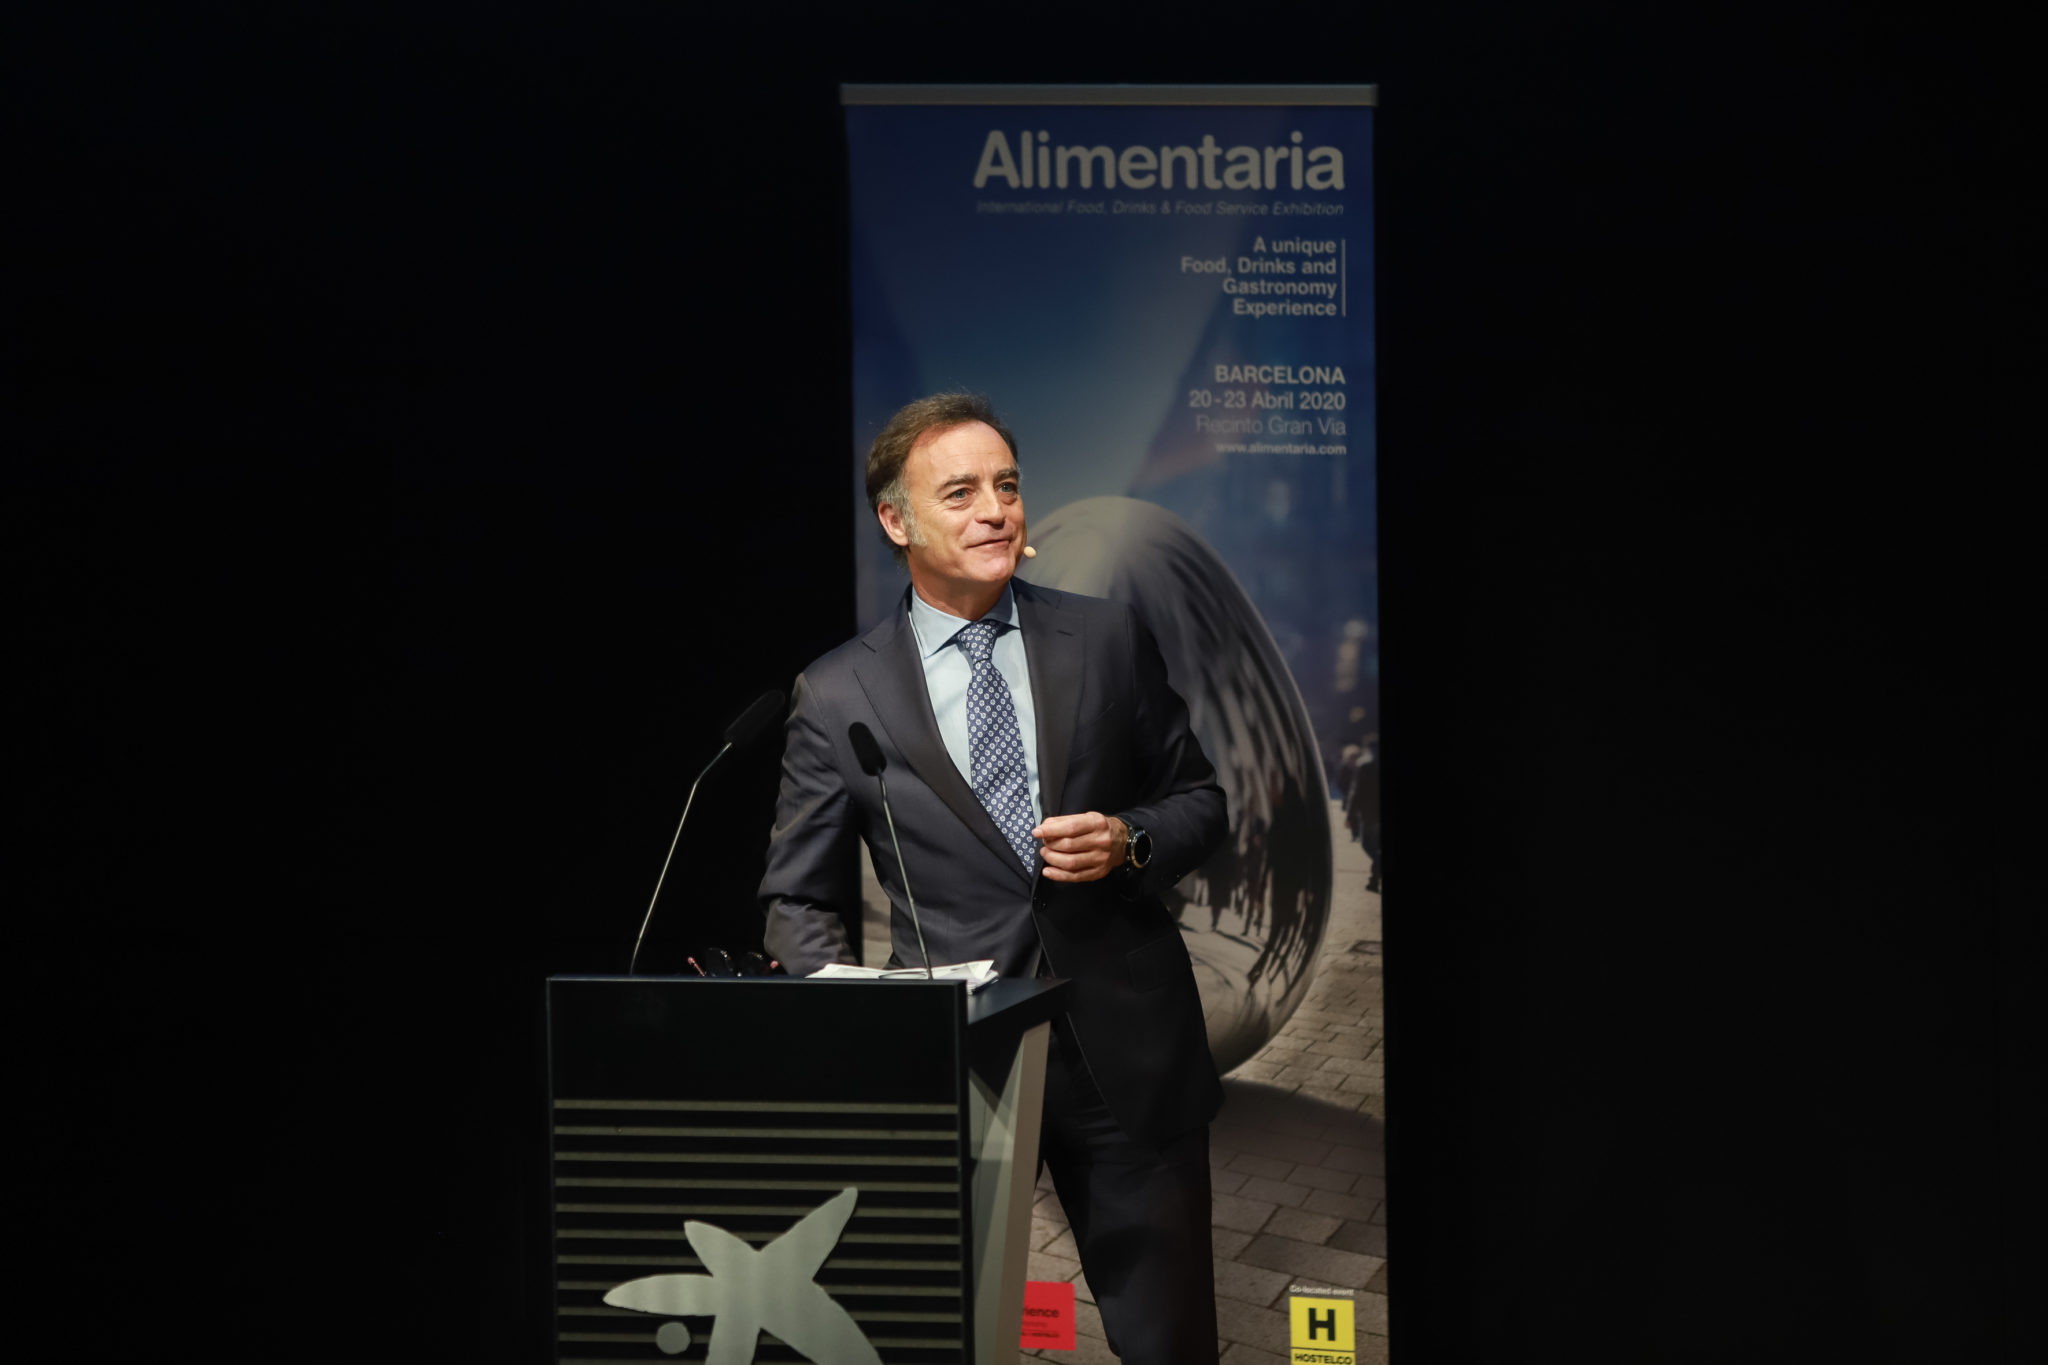 J.Antonio Valls